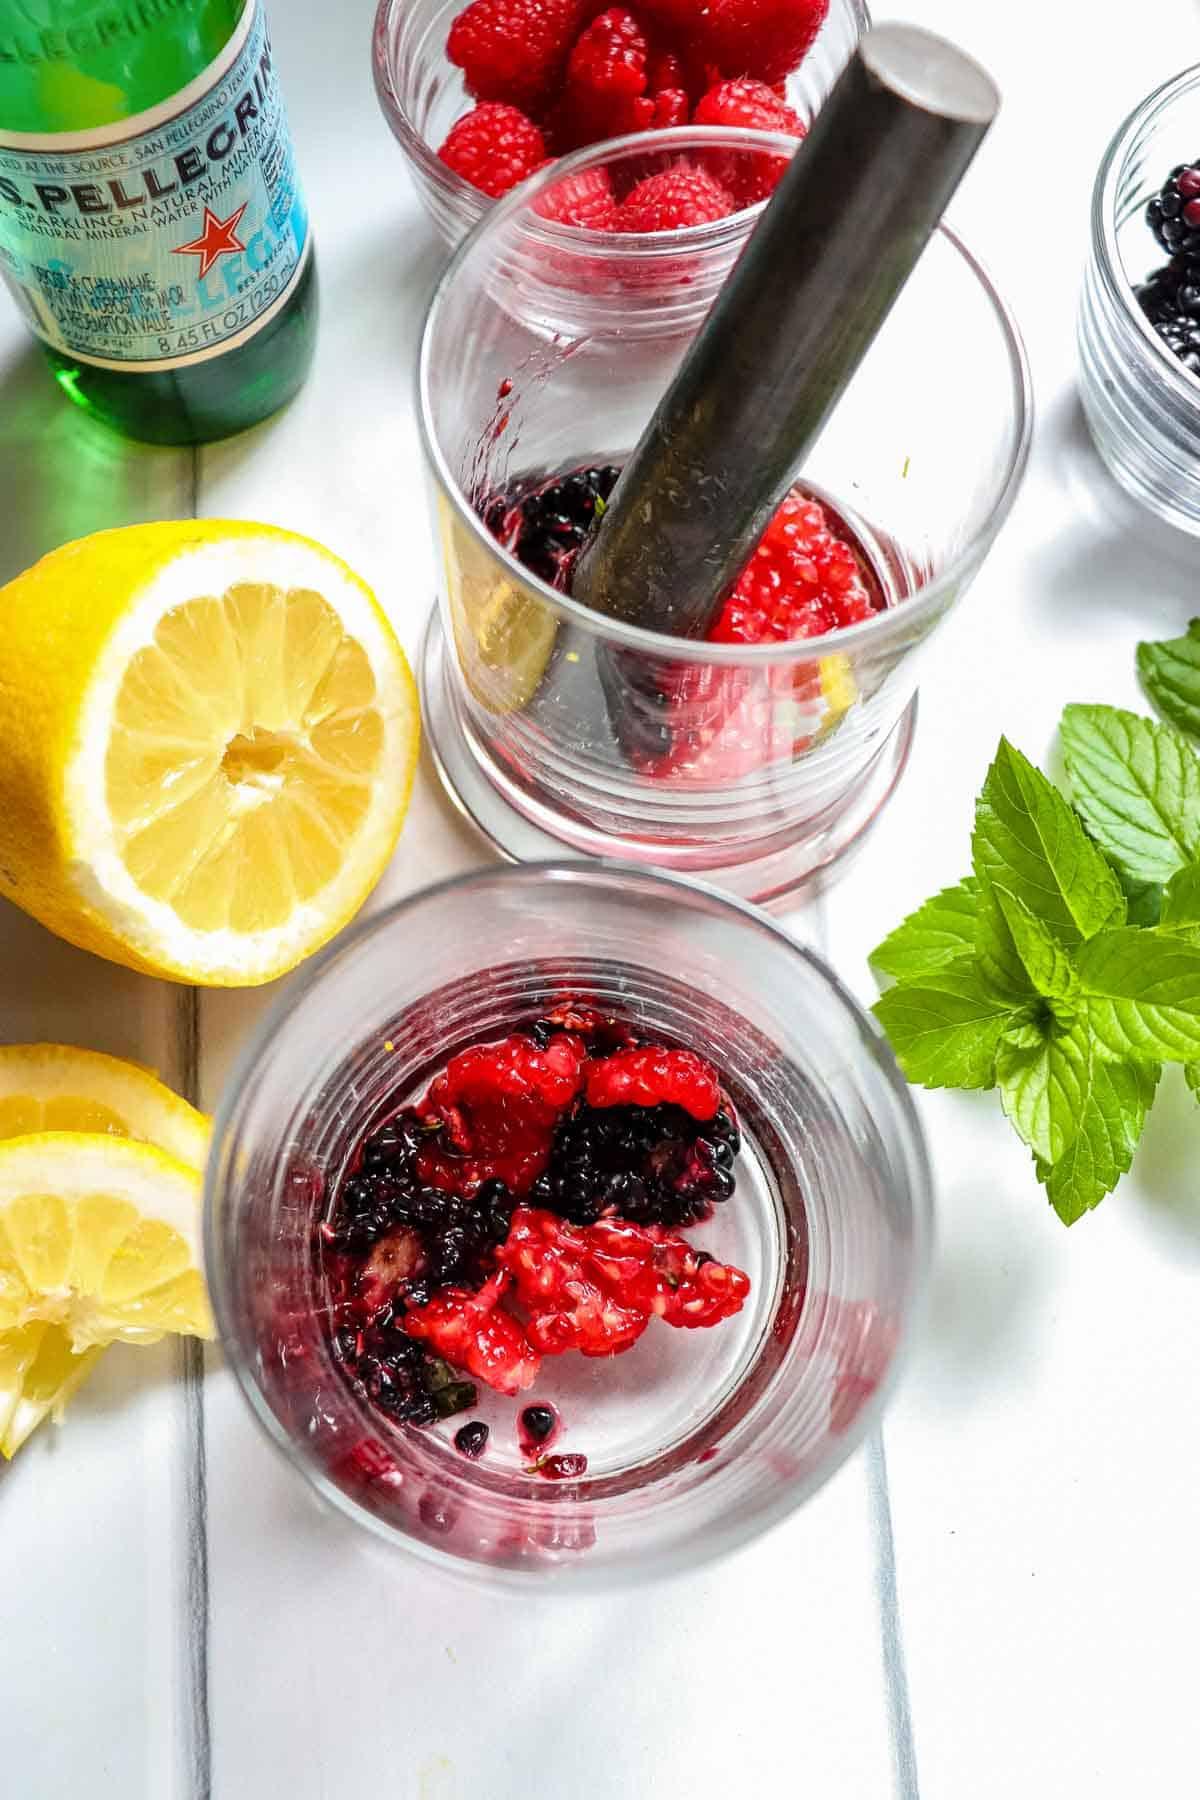 Muddling raspberries and blackberries in a glass.